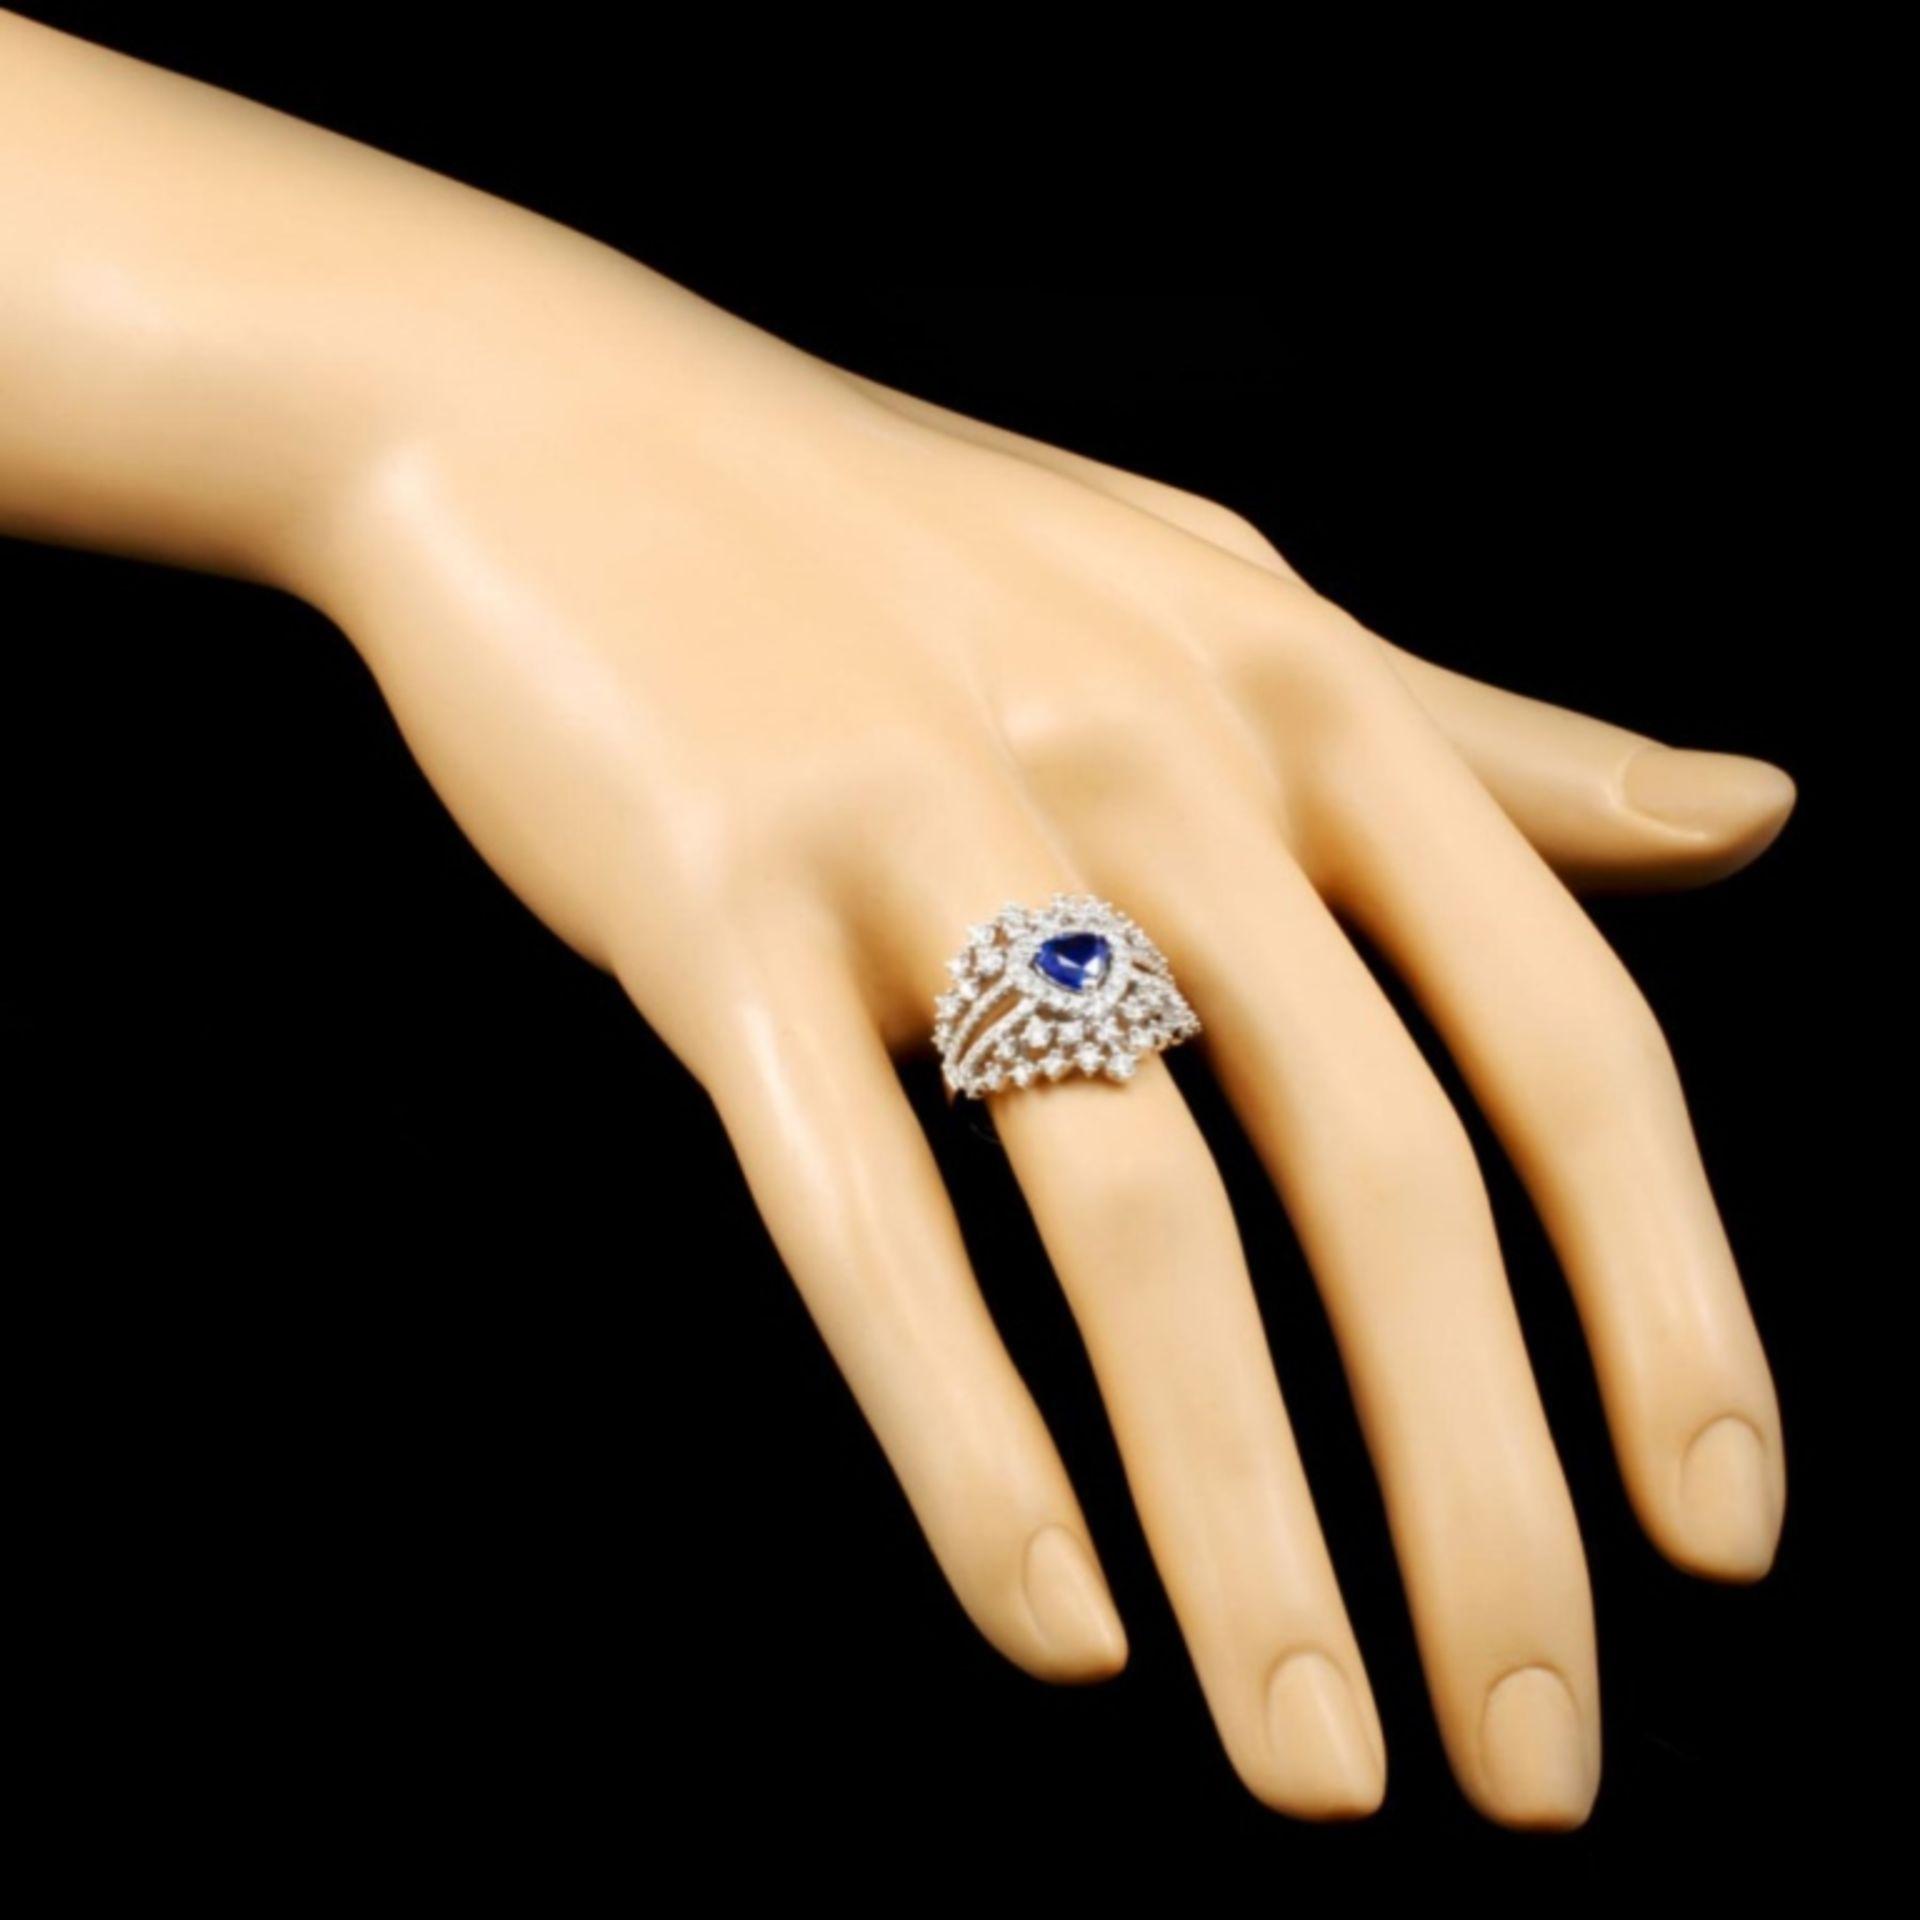 18K Gold 0.83ct Sapphire & 1.02ctw Diamond Ring - Image 3 of 4